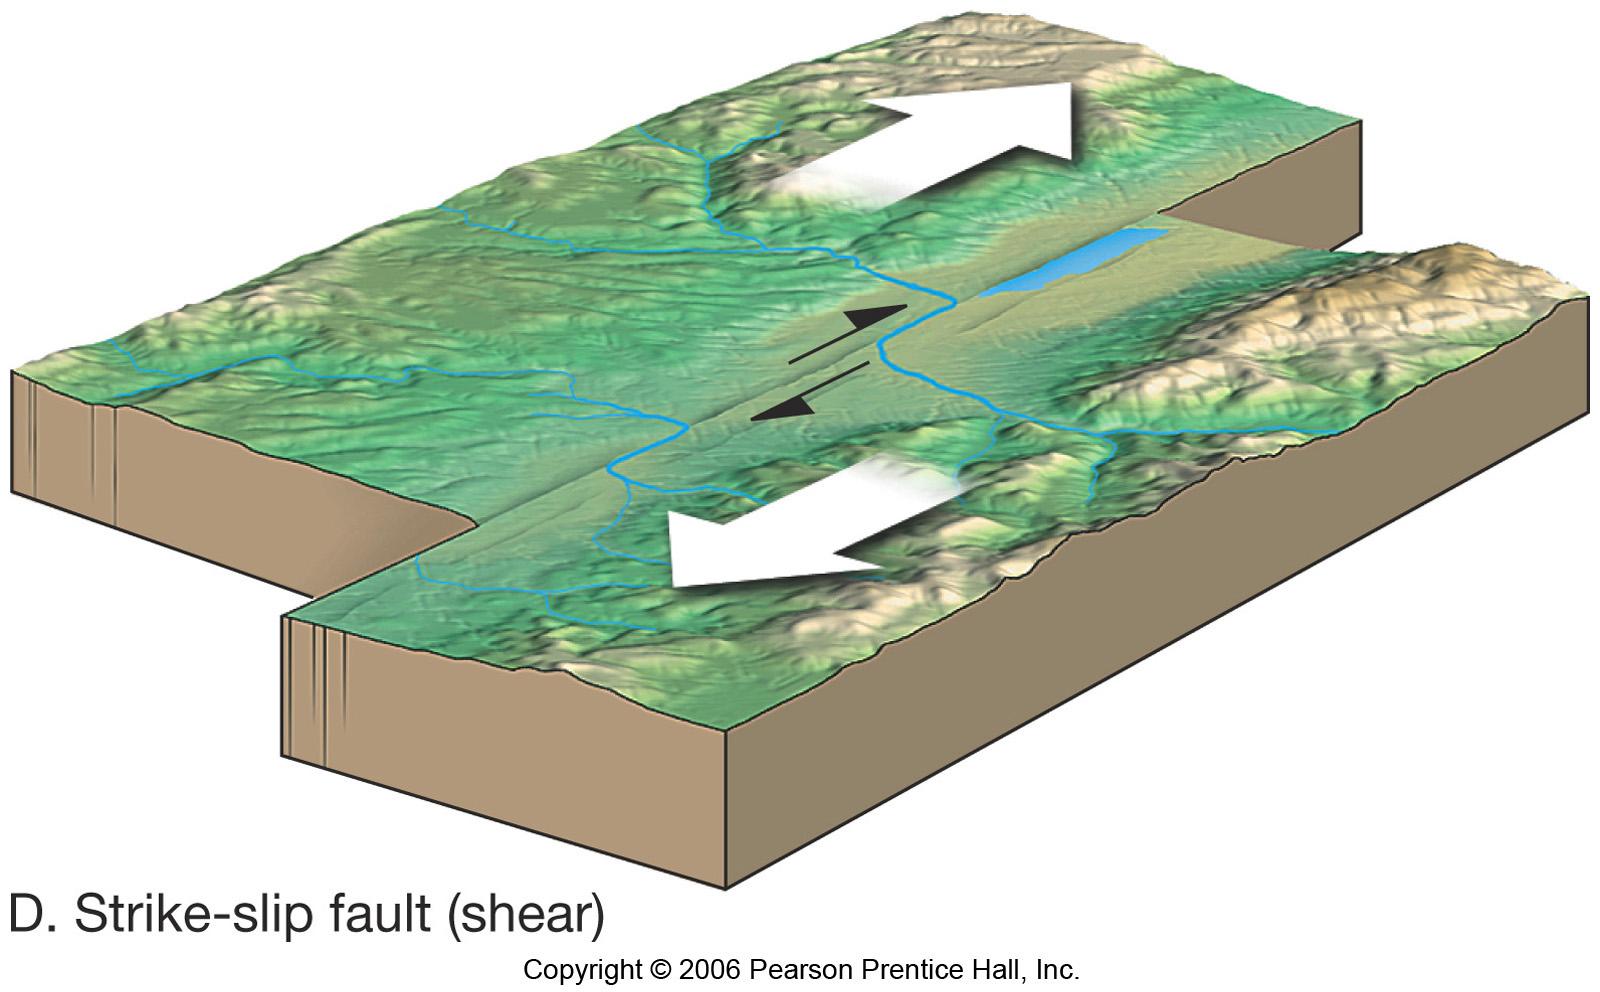 strike slip fault block diagram light wave diffraction 10 12d jpg